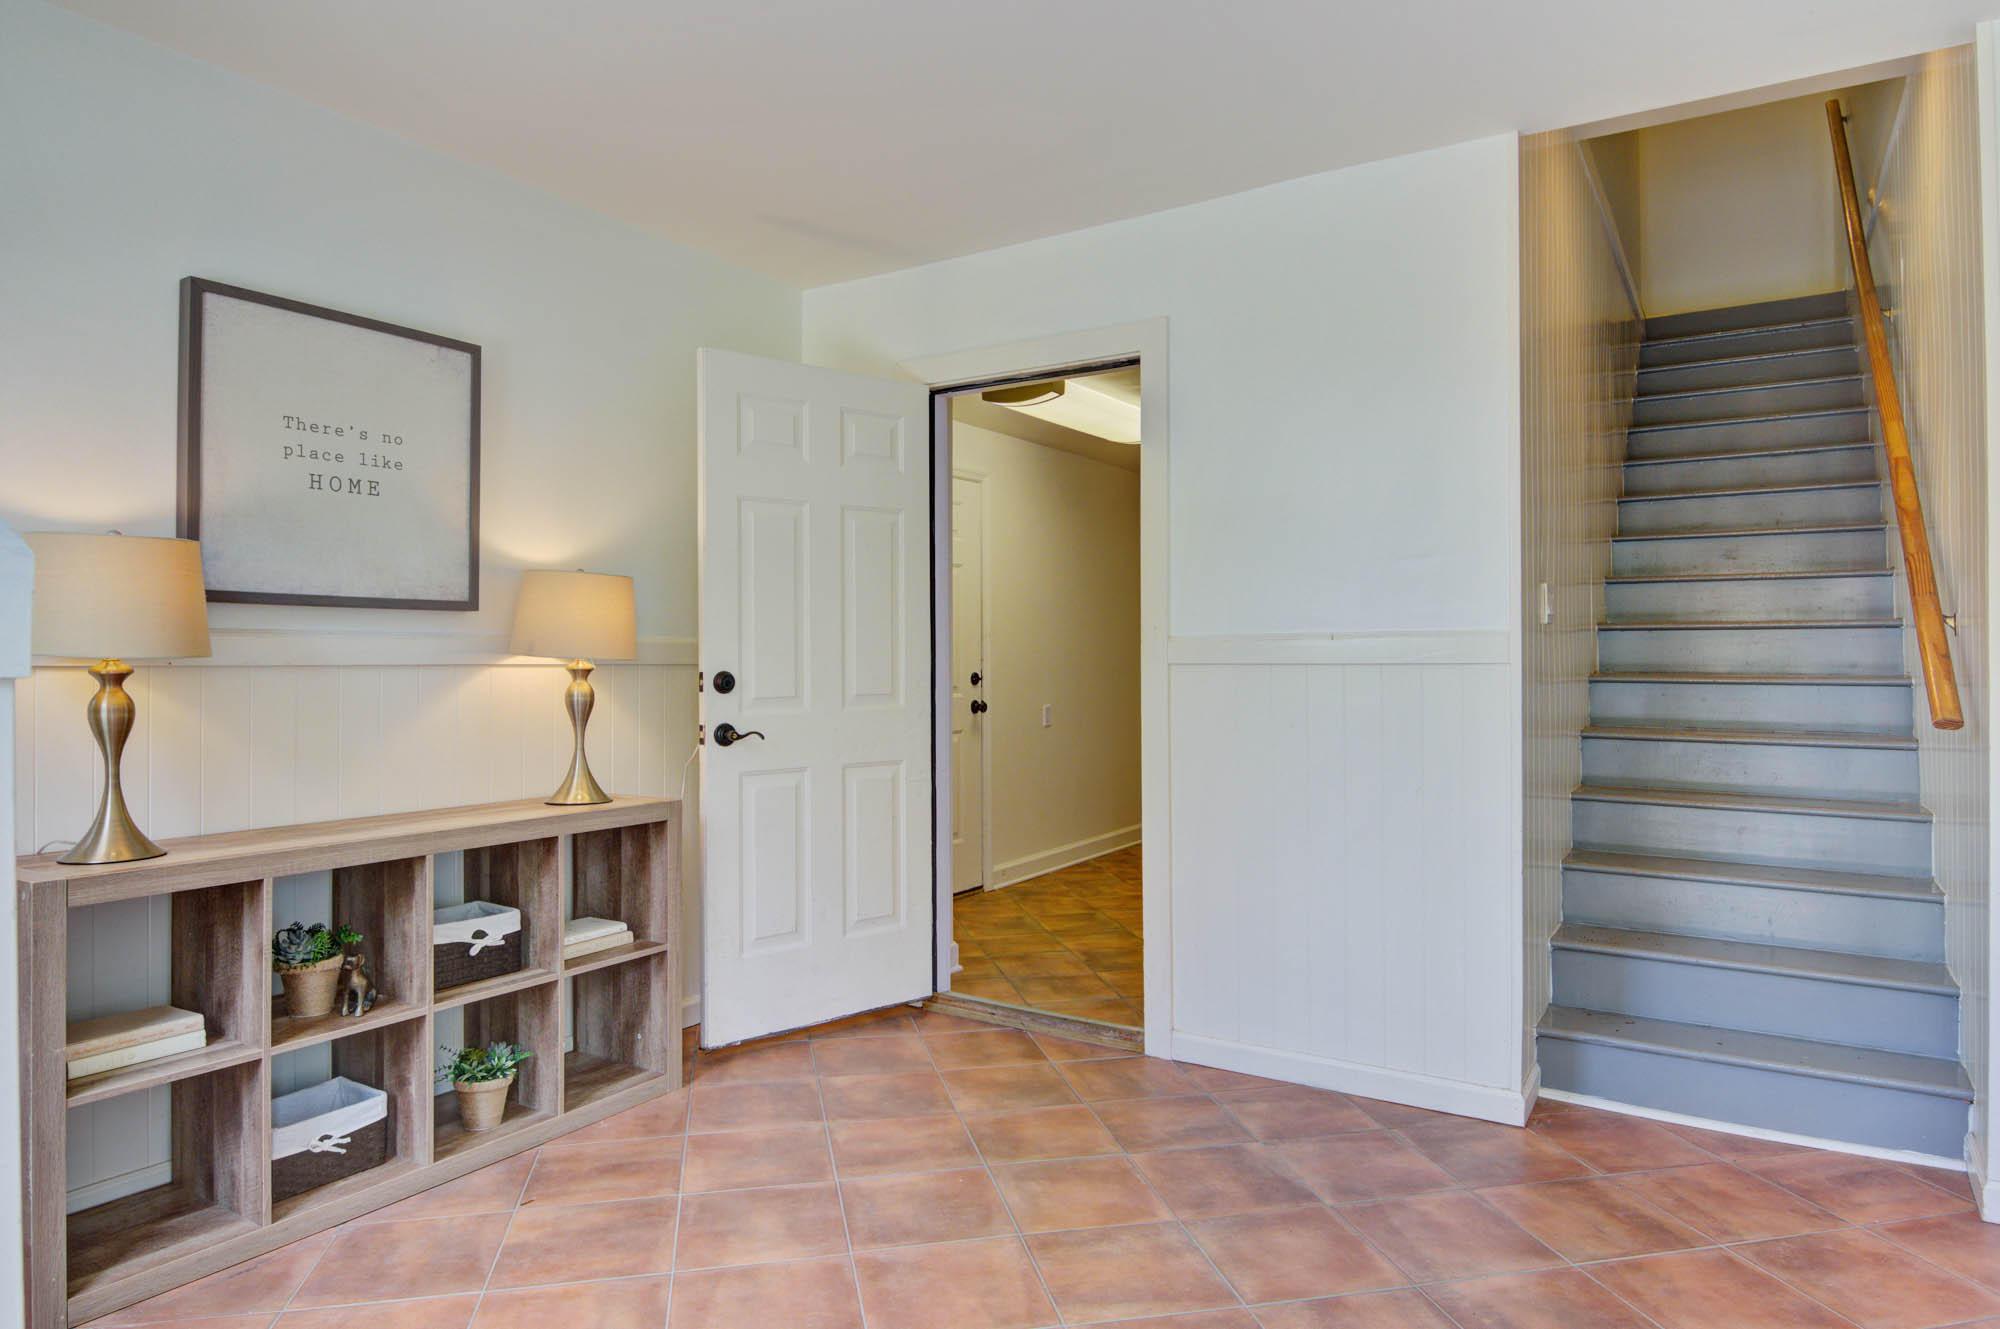 Brickyard Plantation Homes For Sale - 2682 Egrets Landing, Mount Pleasant, SC - 86